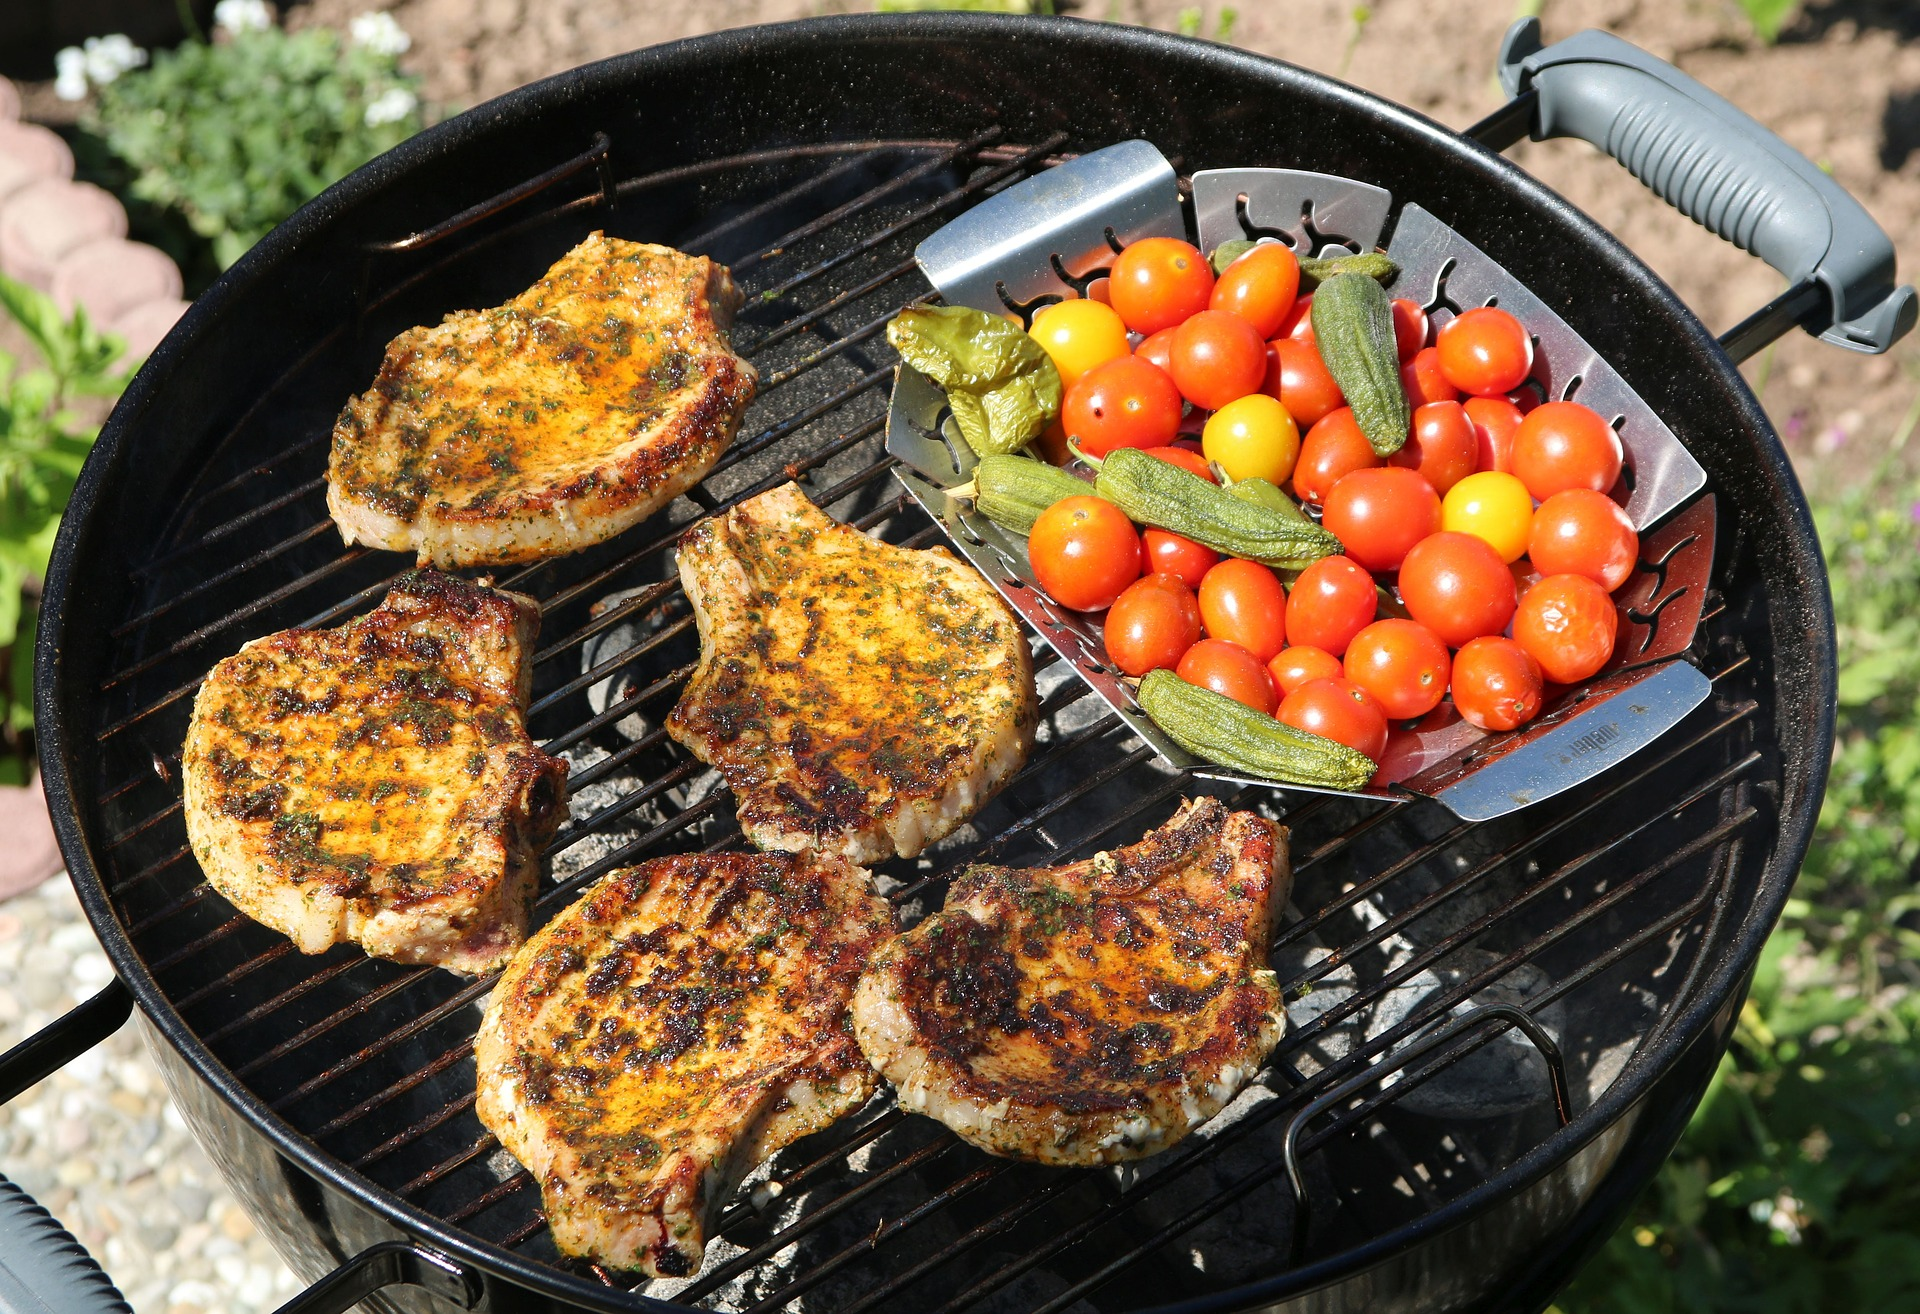 Grill pork chops skill